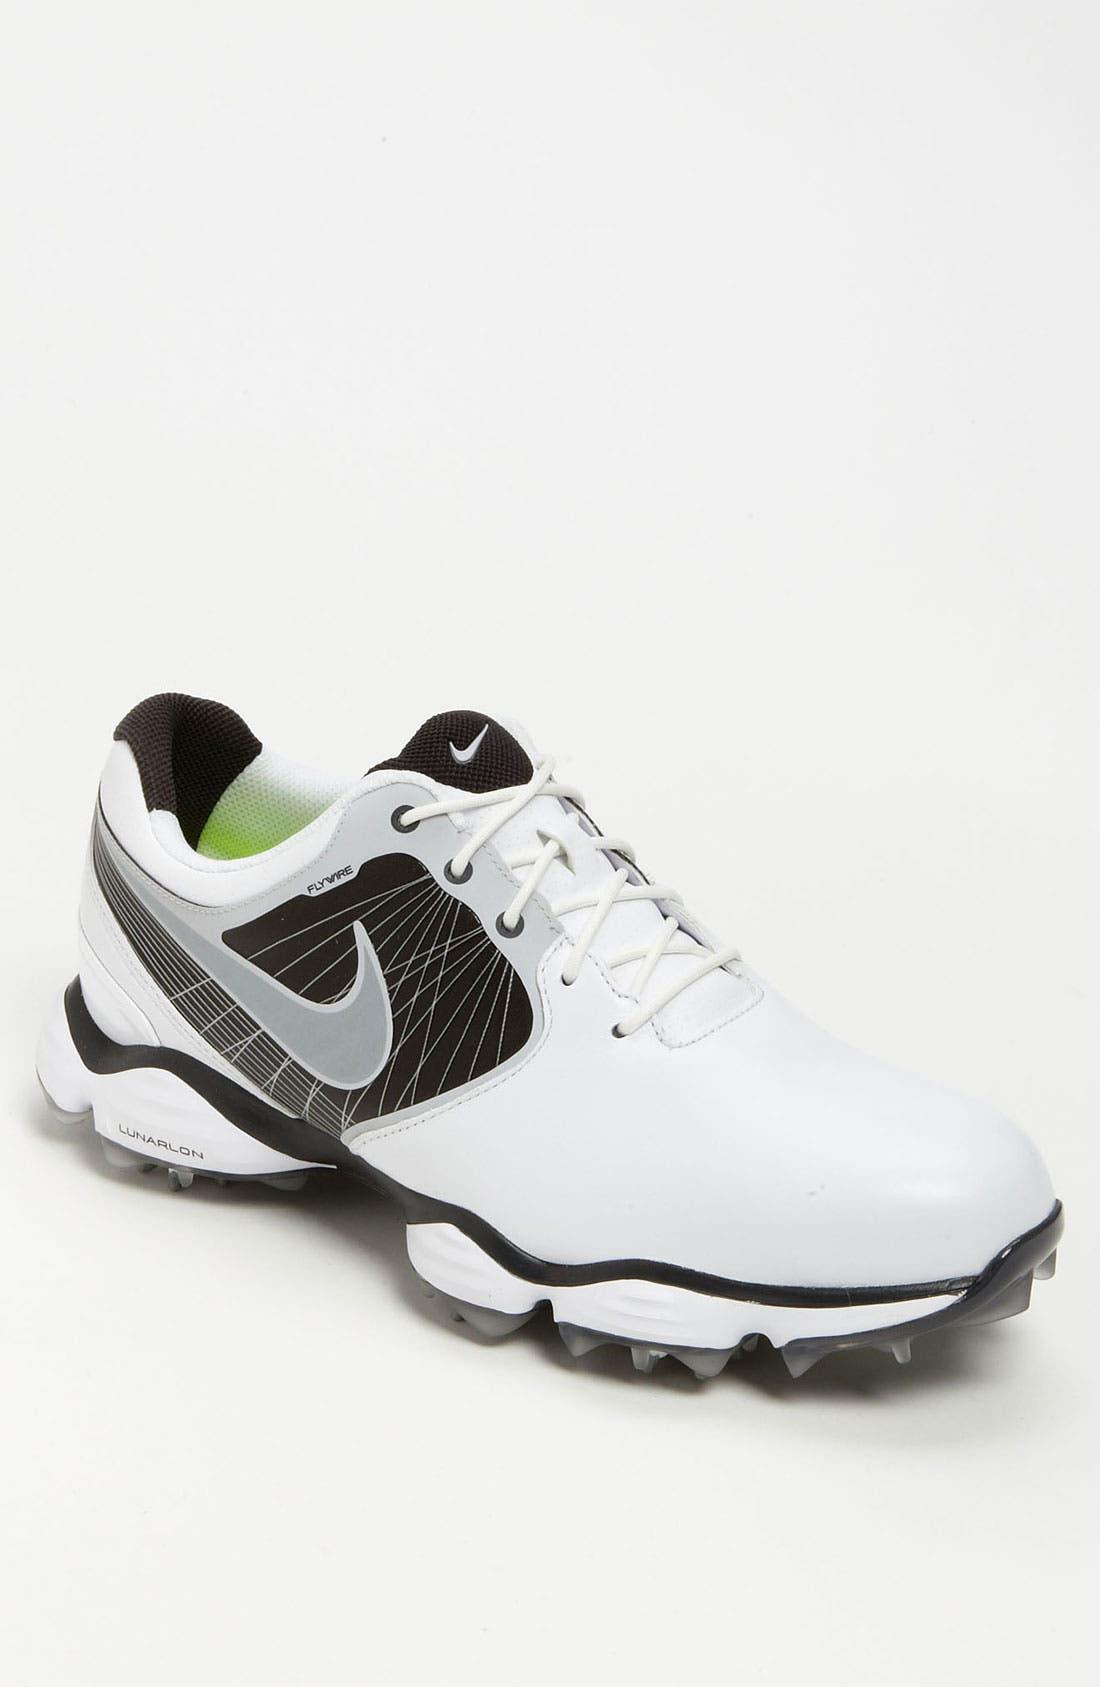 Alternate Image 1 Selected - Nike 'Lunar Control II' Golf Shoe (Men)